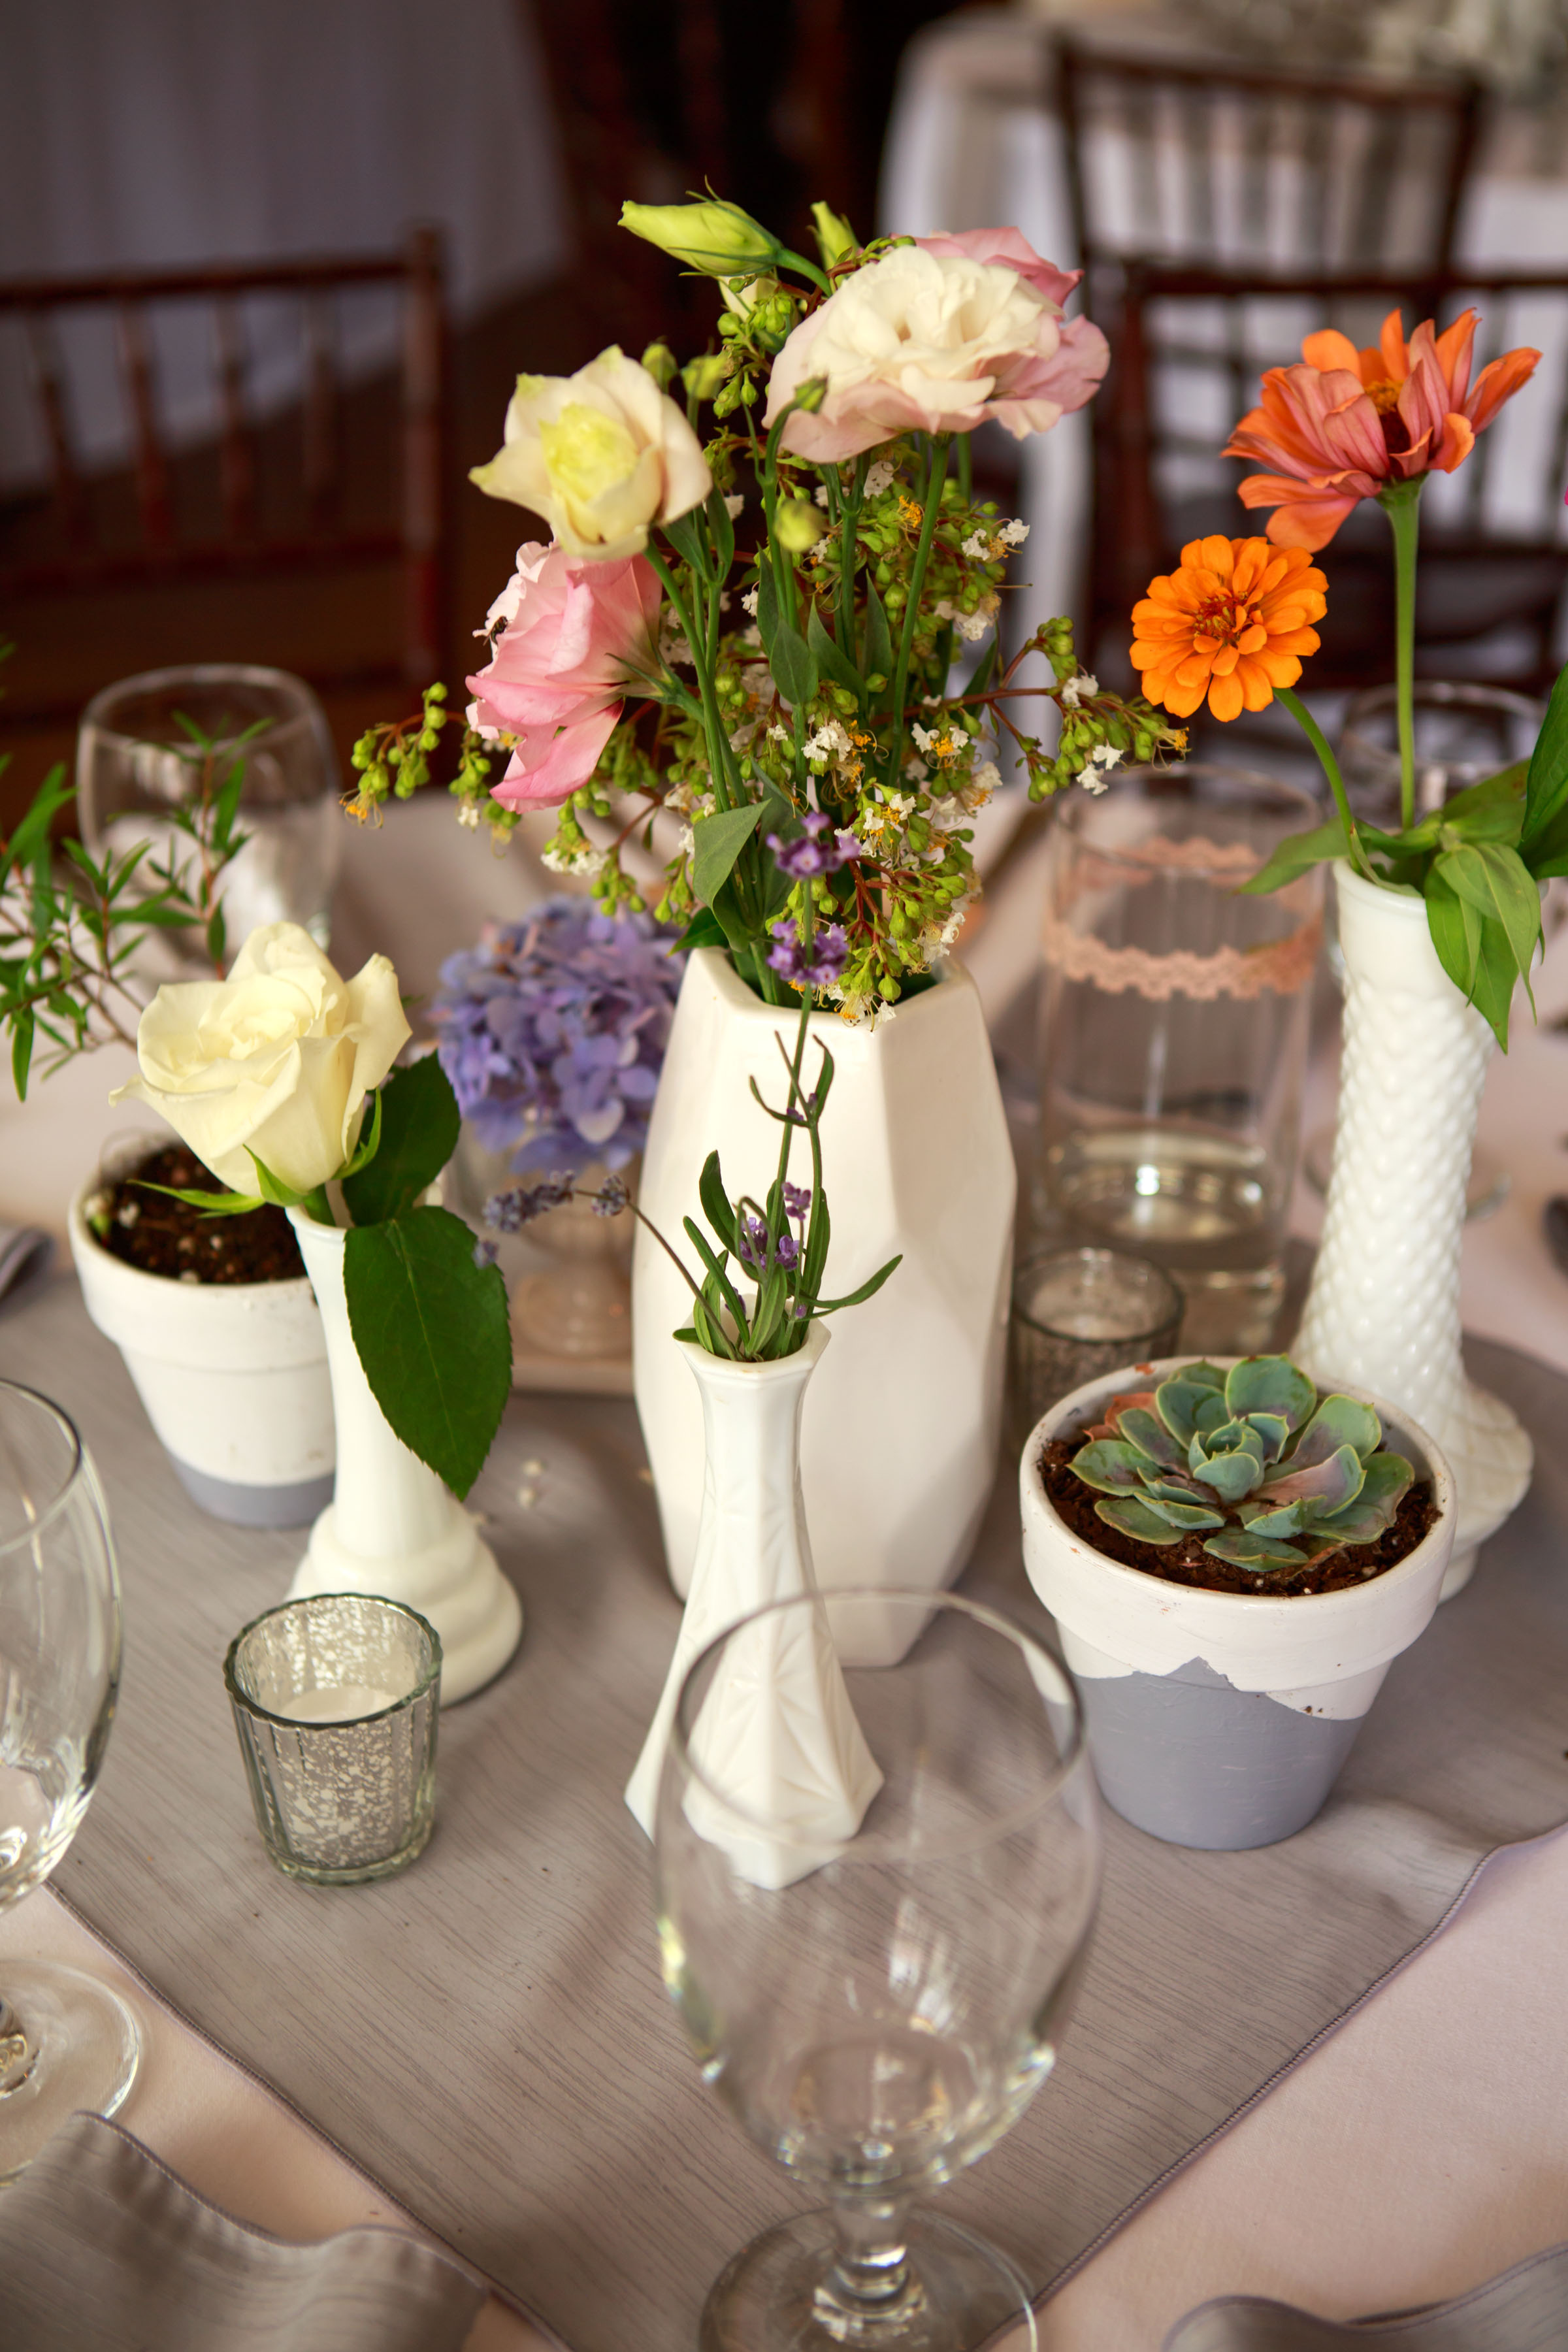 128-South-Wedding-Tiffany-Abruzzo-Photography-Details-15.jpg